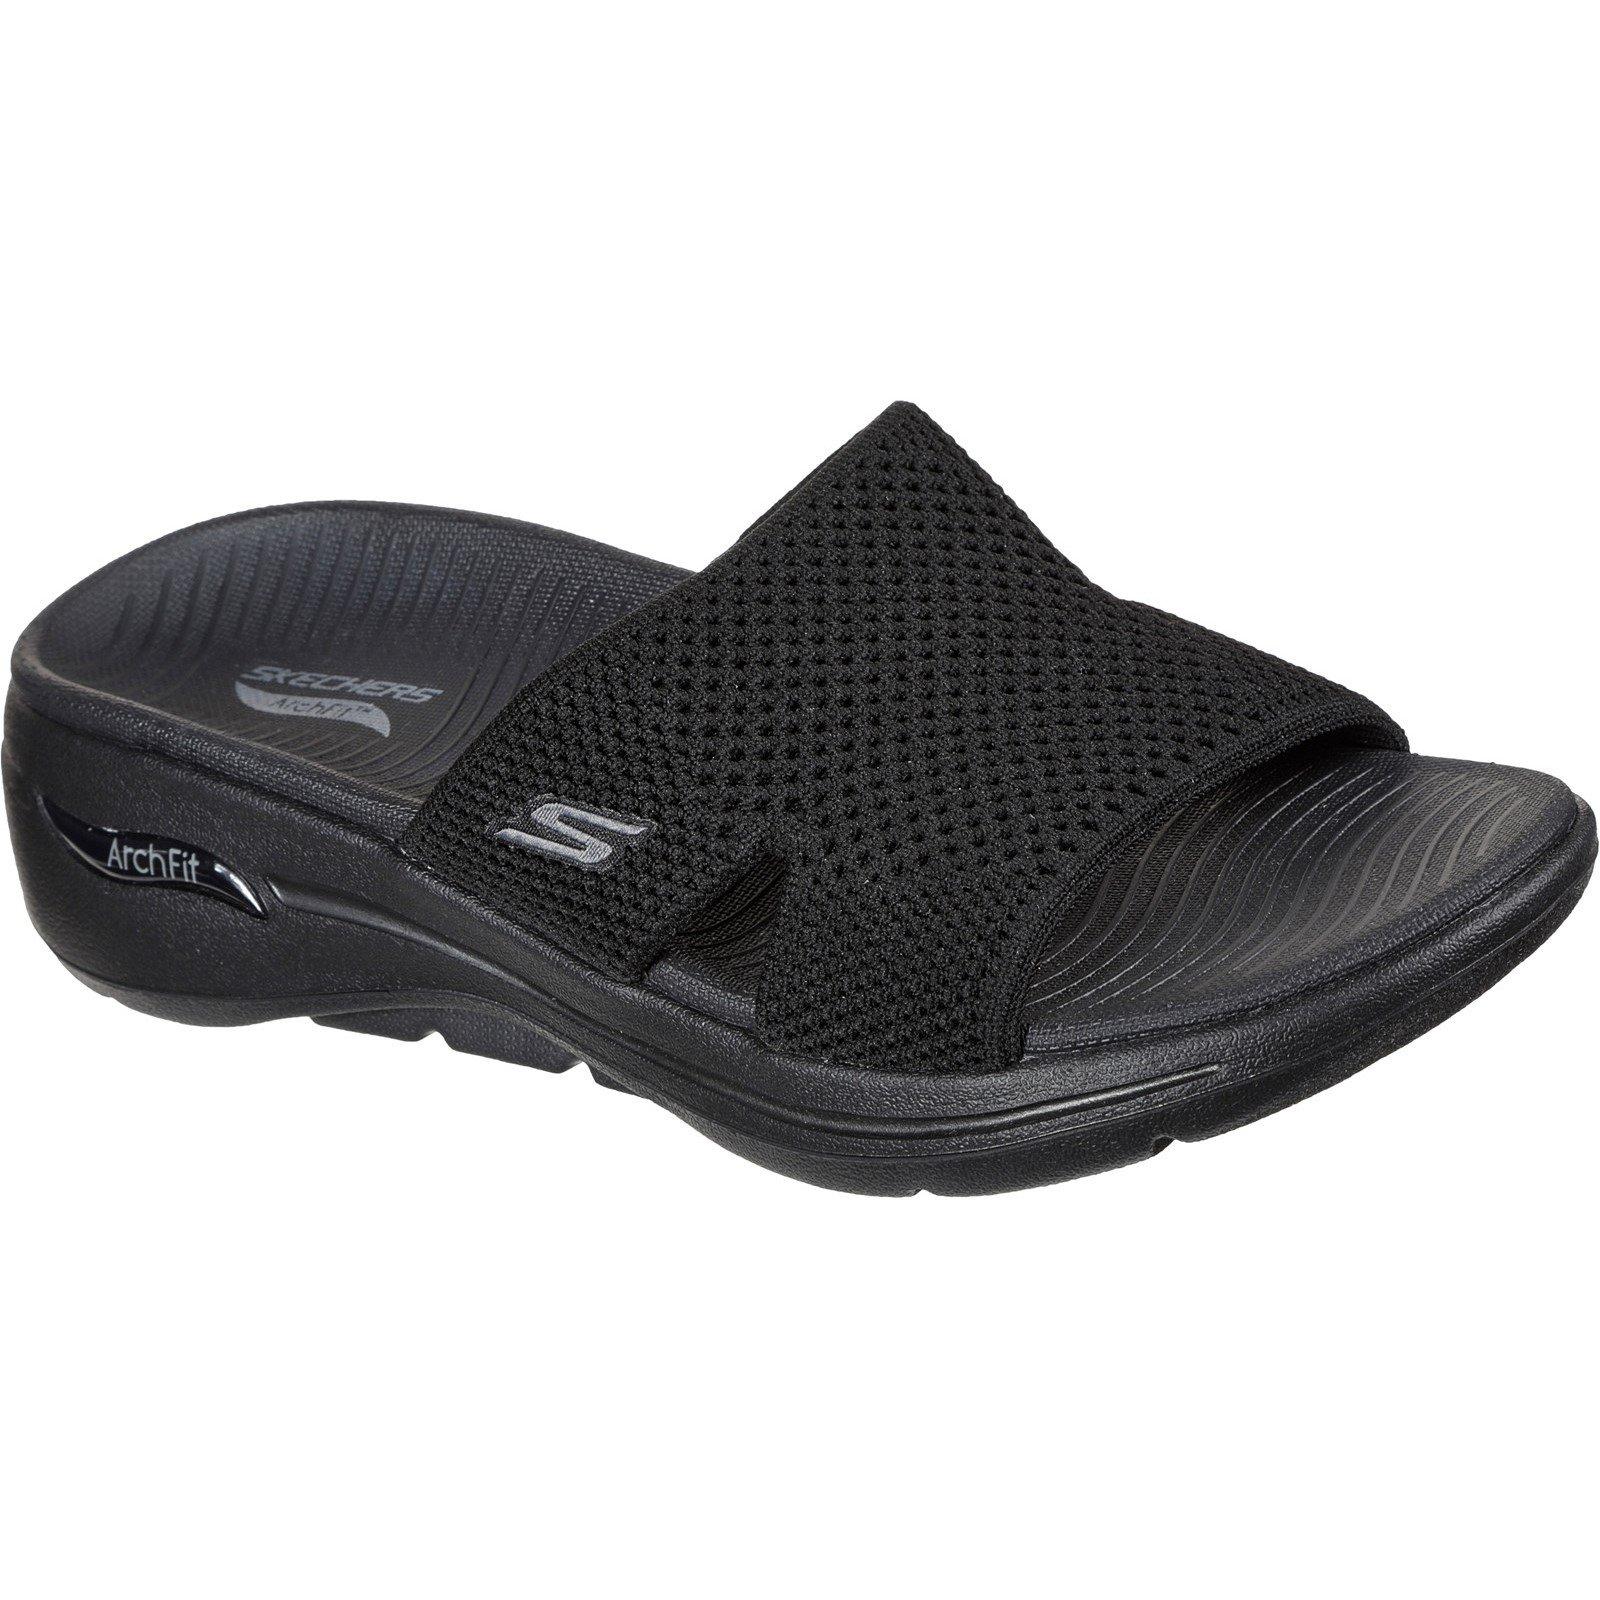 Skechers Women's Go Walk Arch Fit Worthy Summer Sandal Various Colours 32152 - Black 5